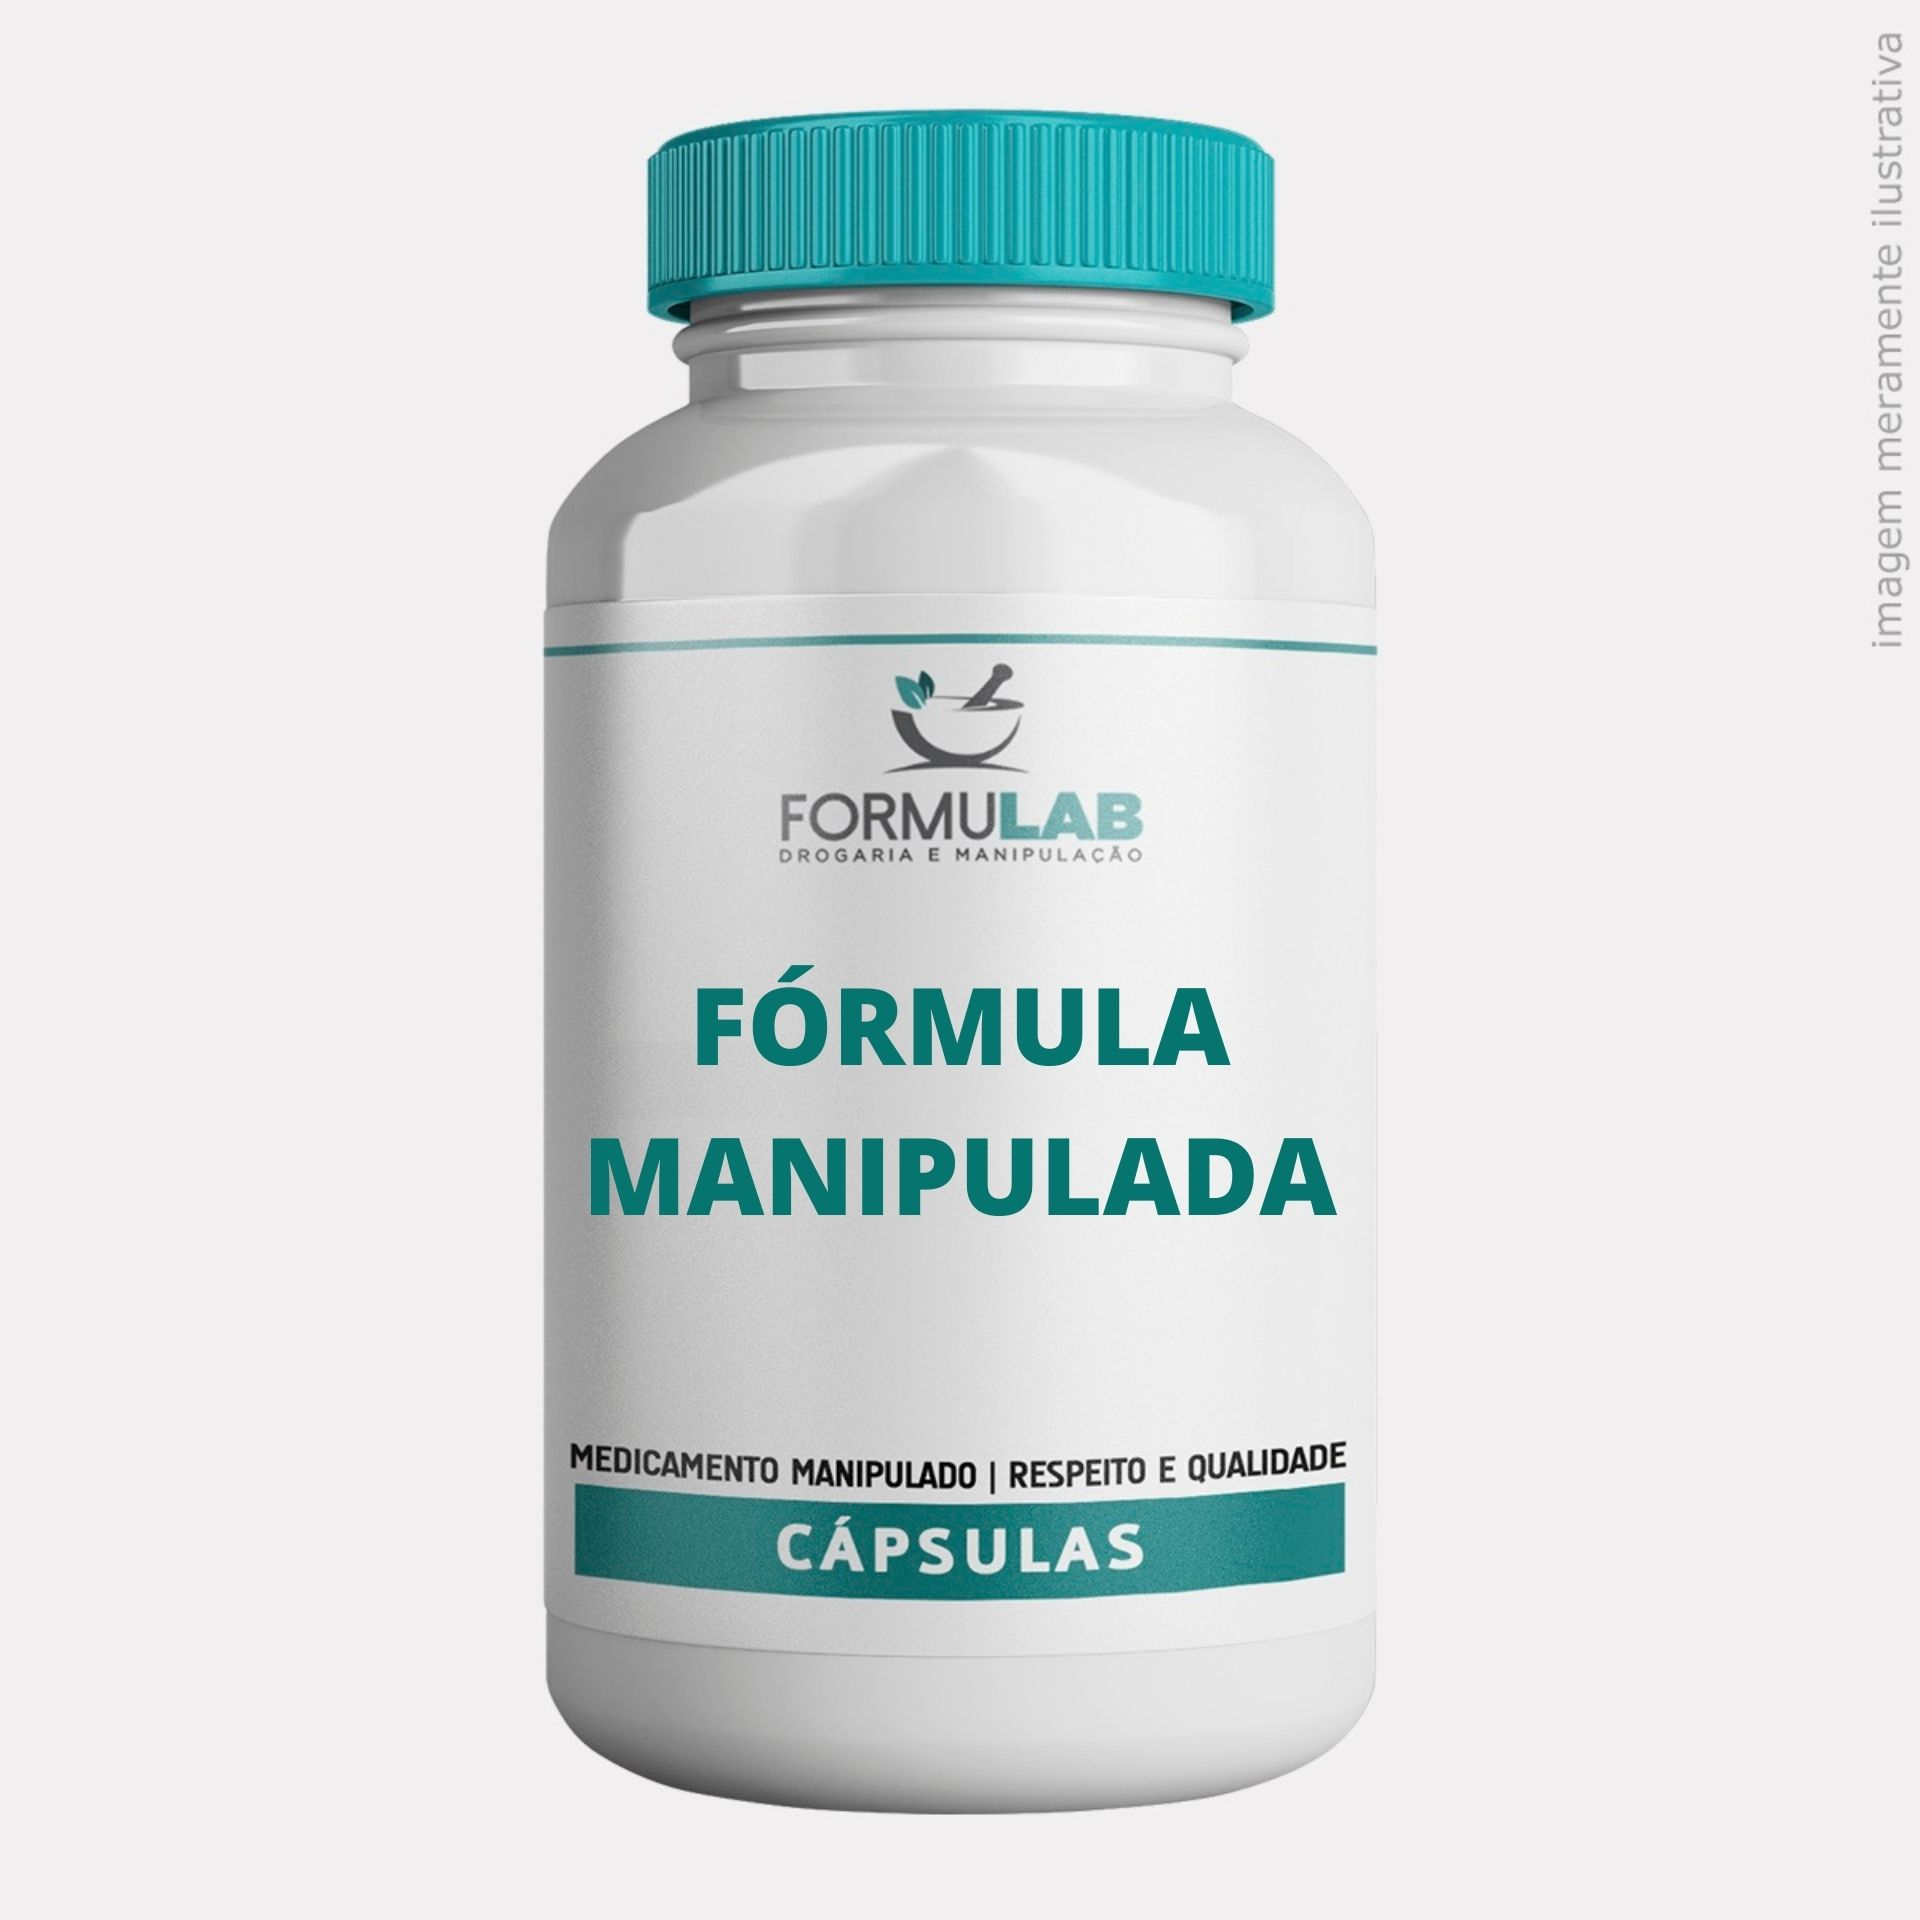 Fórmula Manipulada